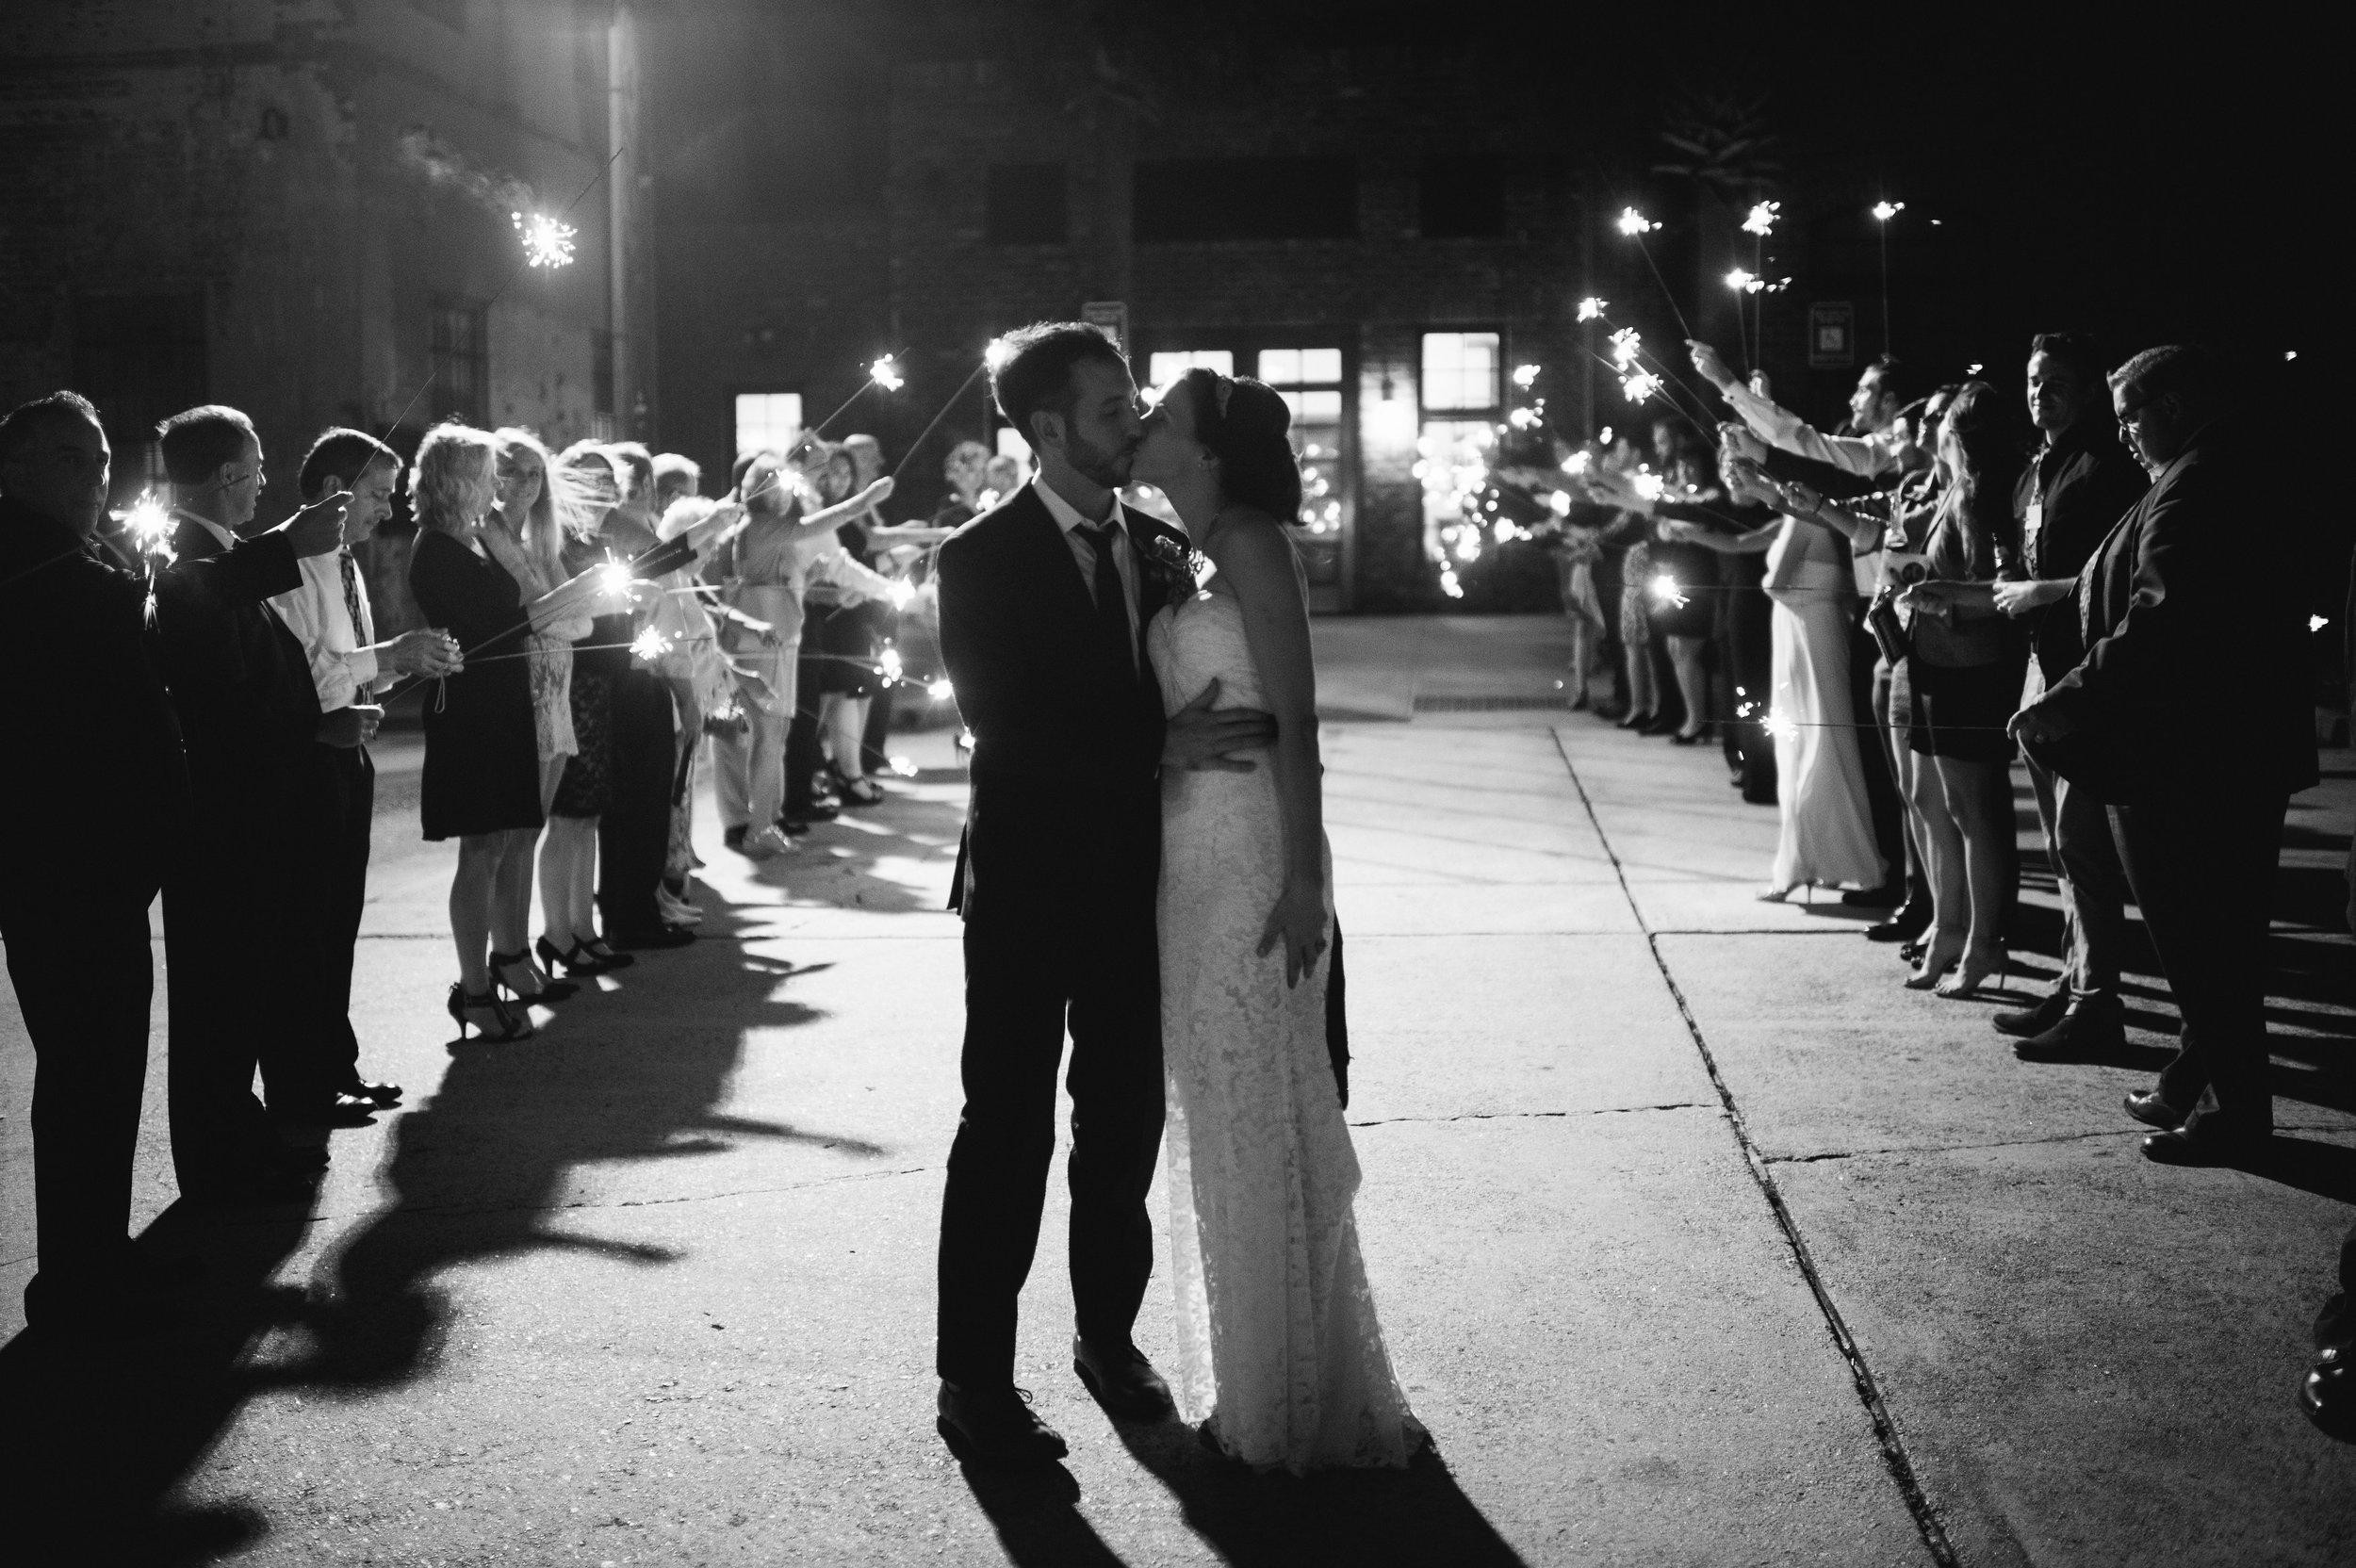 amber-and-paul-rach-loves-troy-charles-h-morris-center-wedding-sarah-seven-helene-lace-wedding-dress-ivory-and-beau-bridal-boutique-savannah-wedding-planner-savannah-event-designer-savannah-florist-savannah-weddings-savannah-bridal-boutique-47.jpg